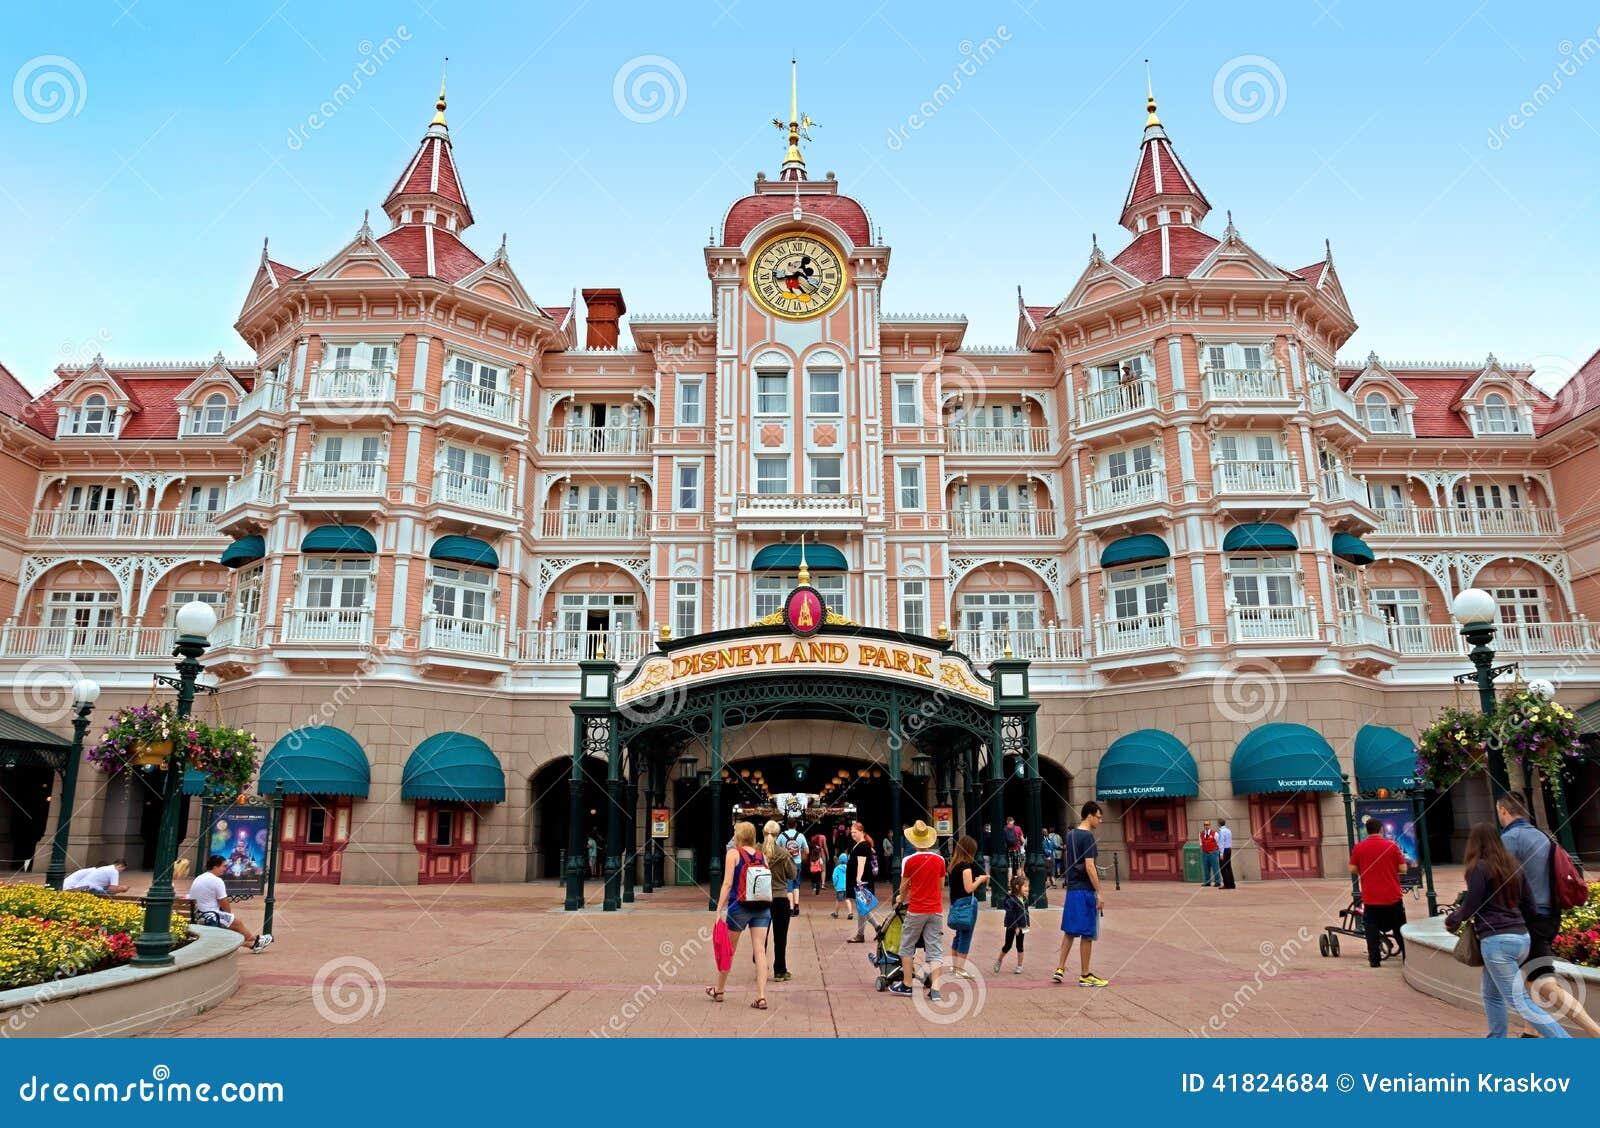 Disneyland Hotel Marne La Vallee France